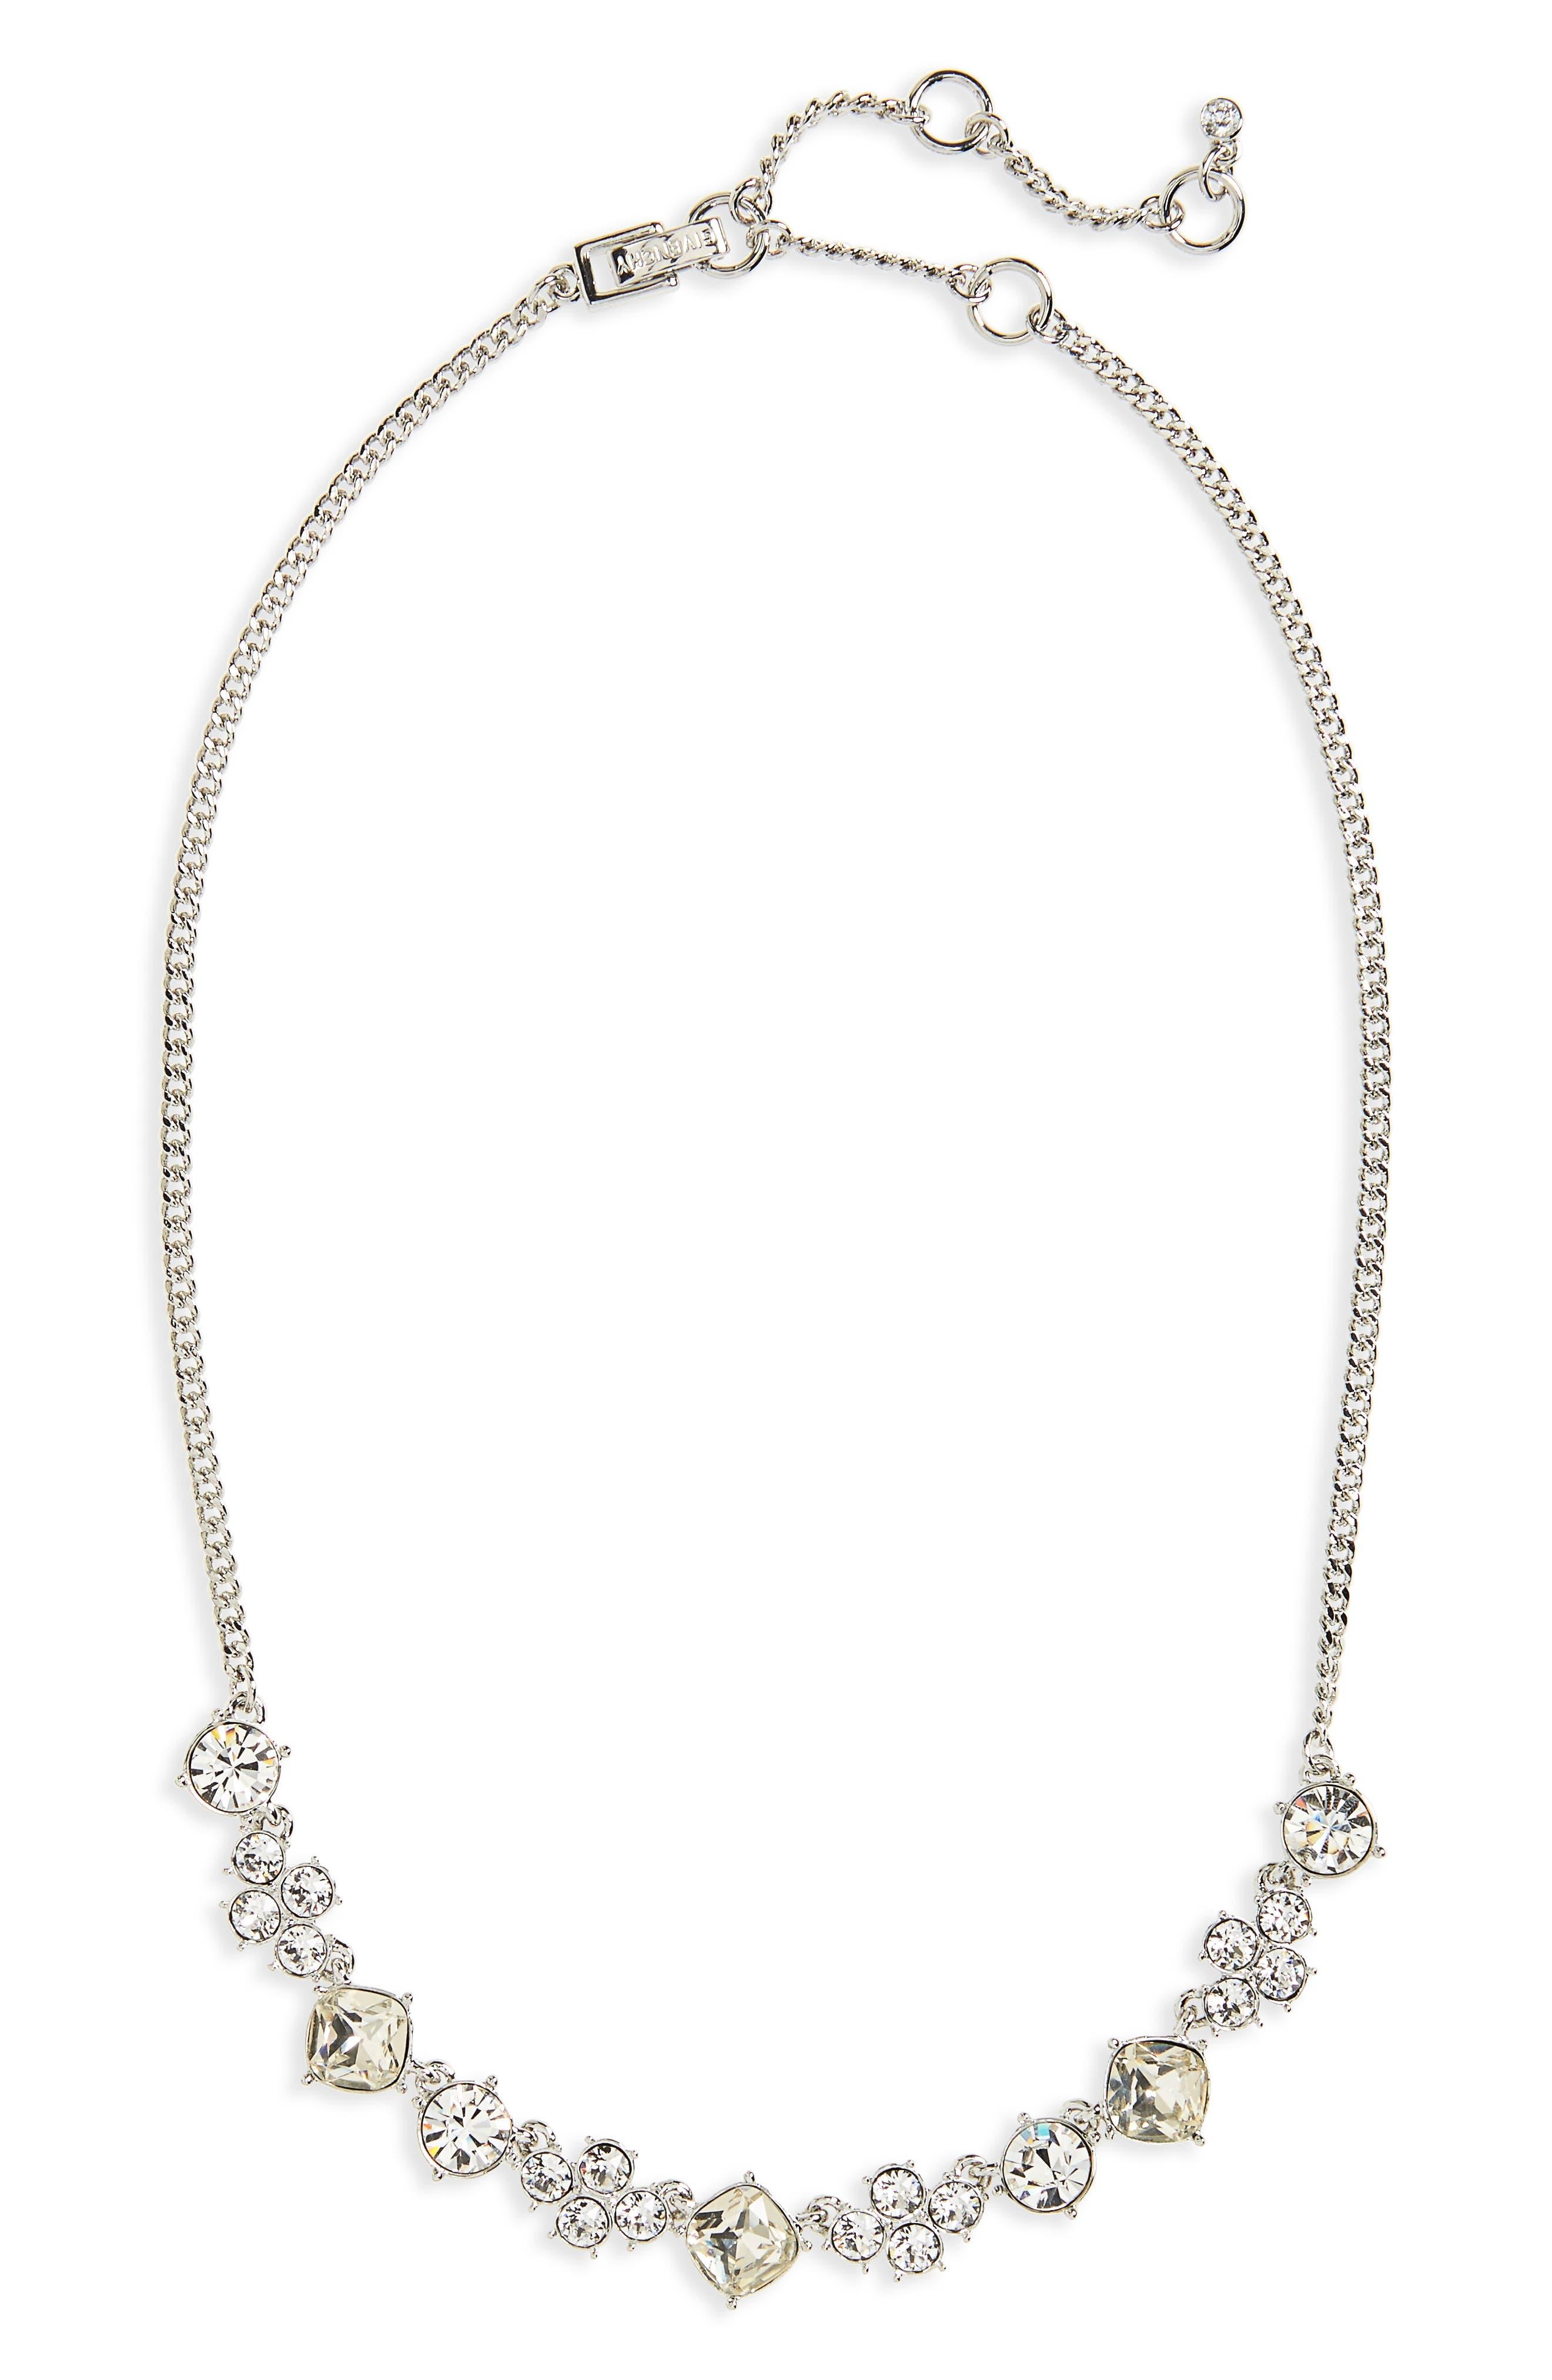 Devon Frontal Necklace,                         Main,                         color, Clear / Silver